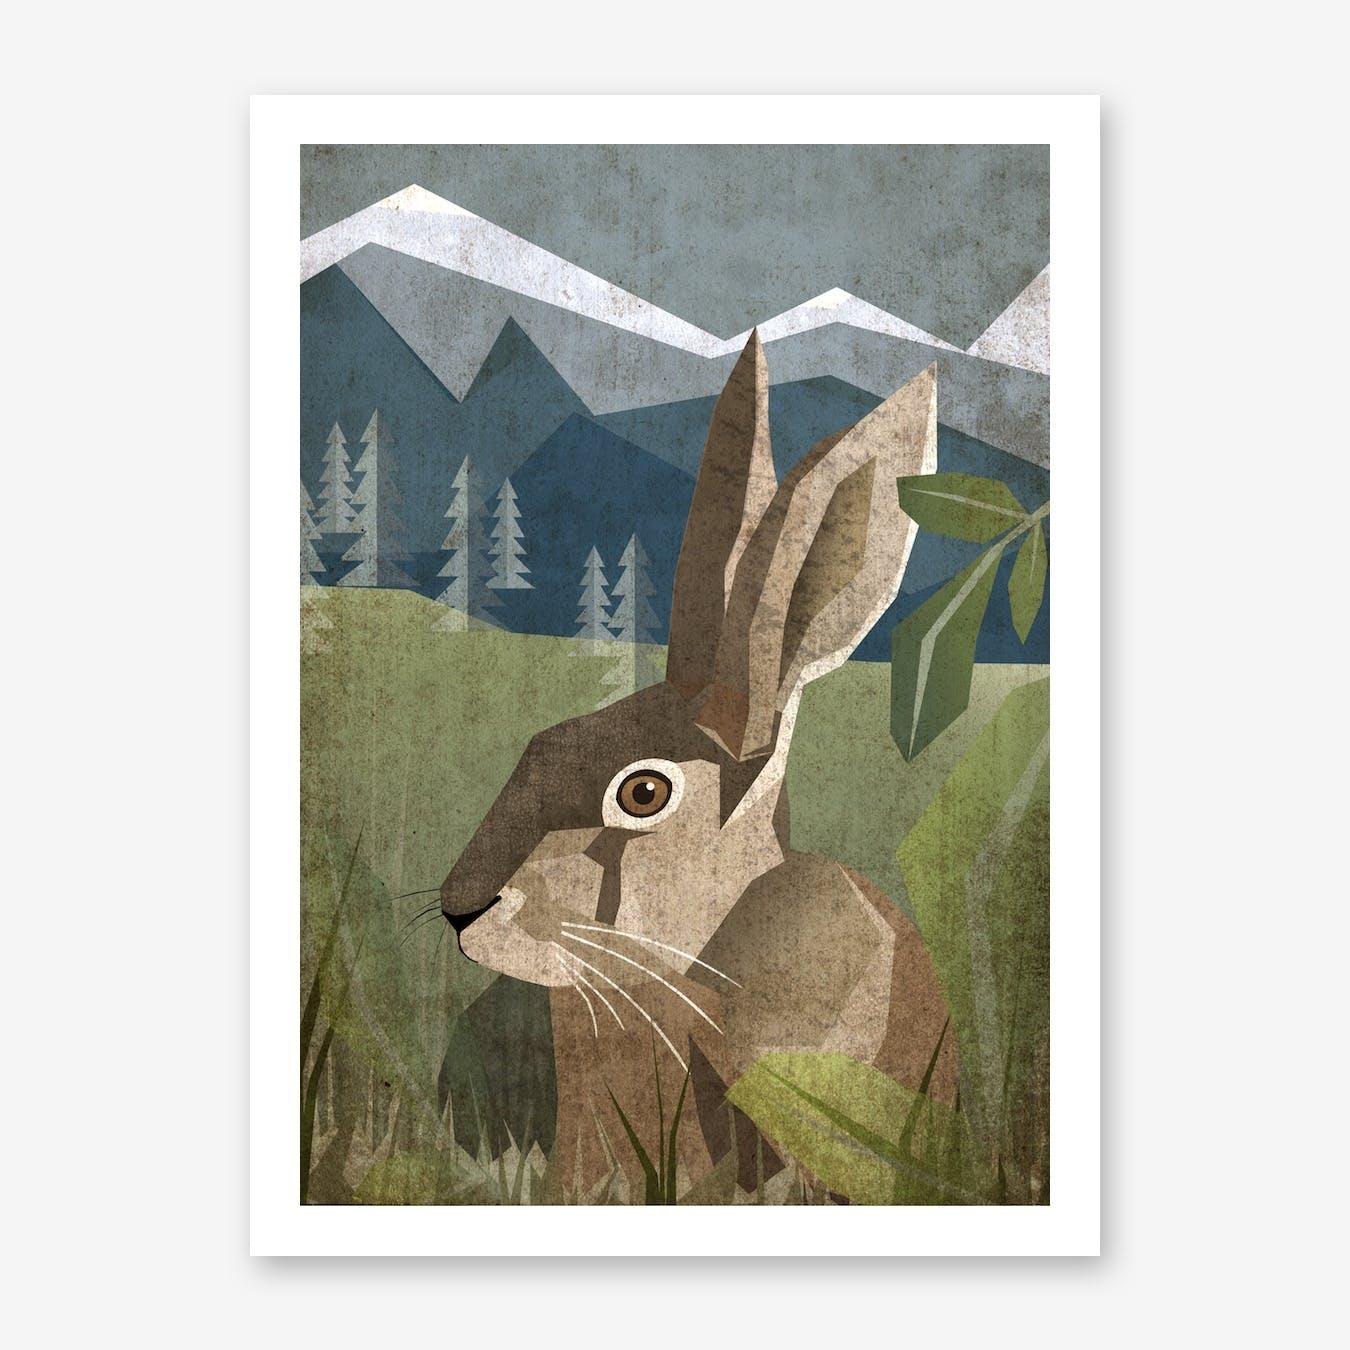 Illu Rabbit